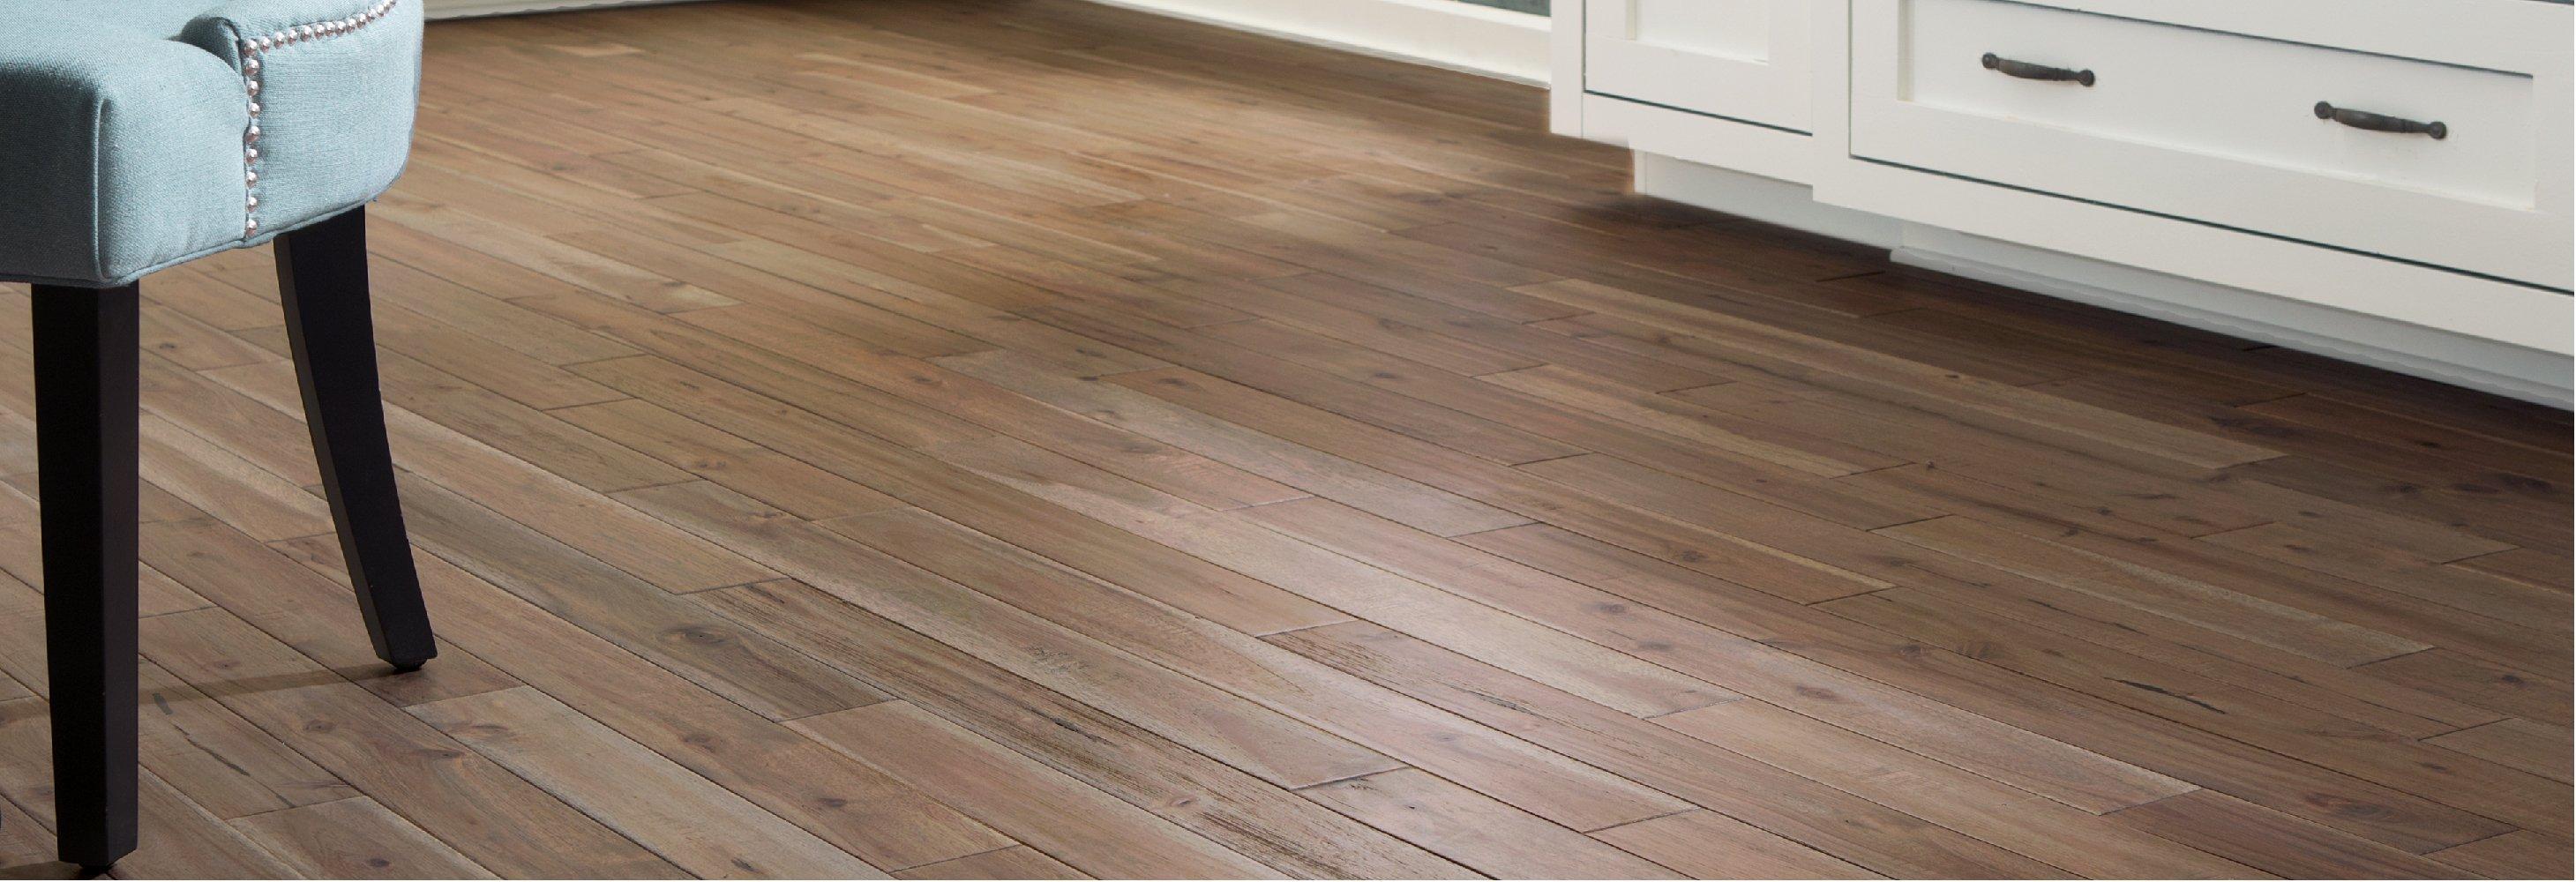 solid hardwood flooring UBUJHGK